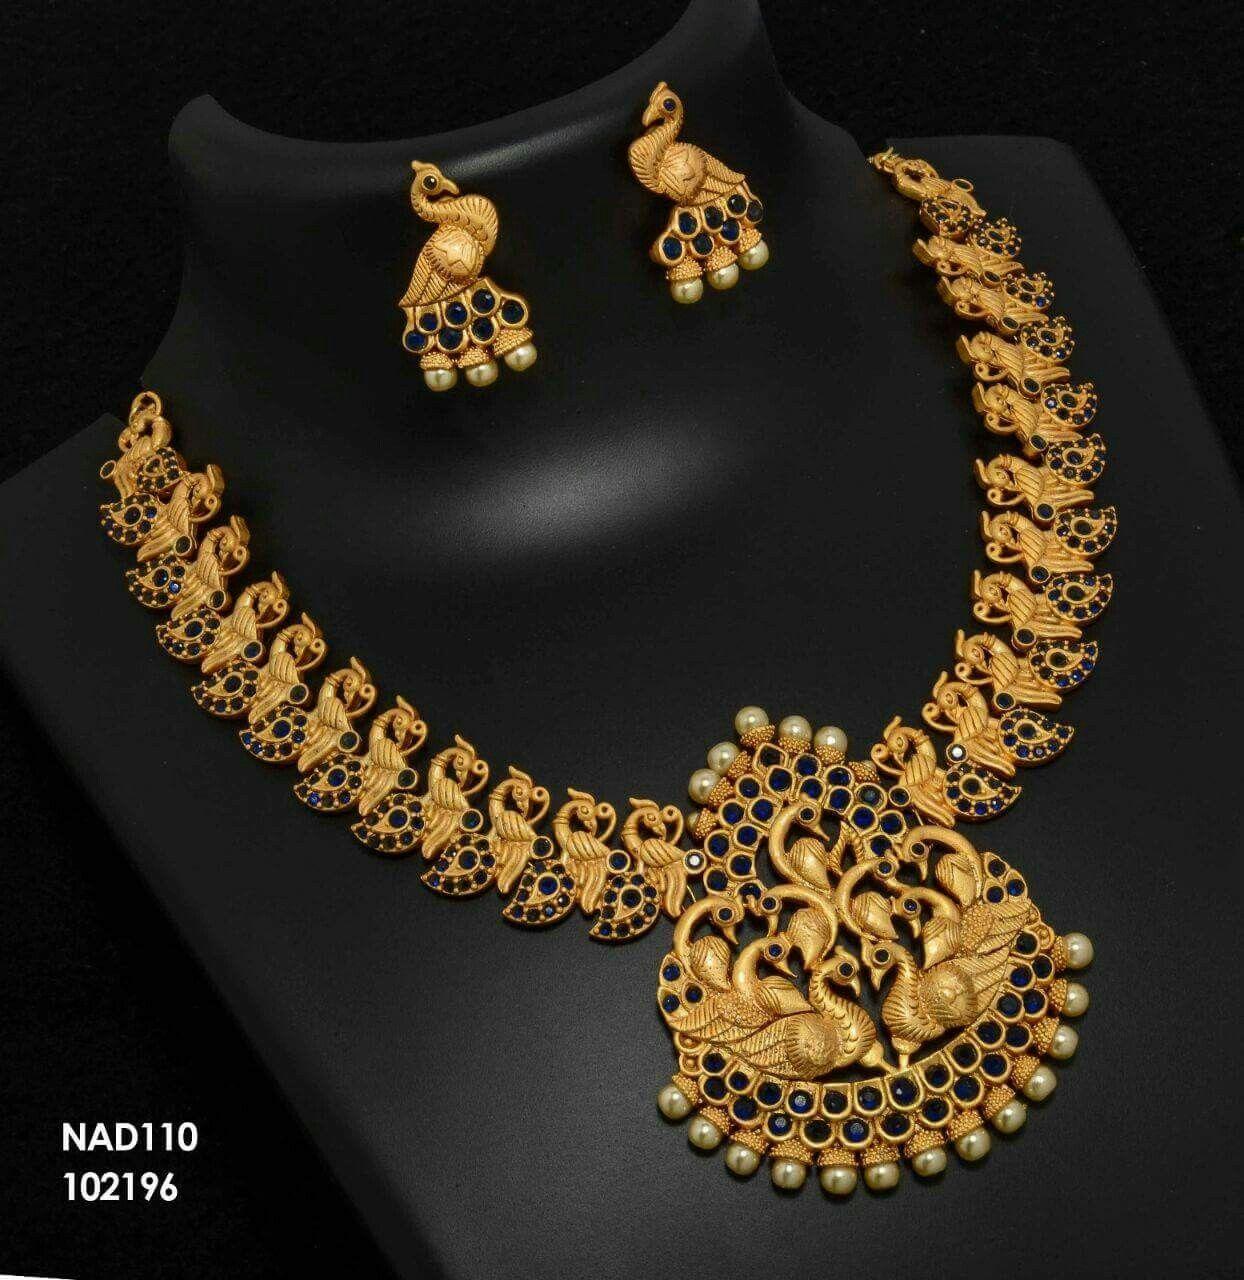 Pin by Swathe Sri on Jewell collection sri** | Pinterest | Jewel ...